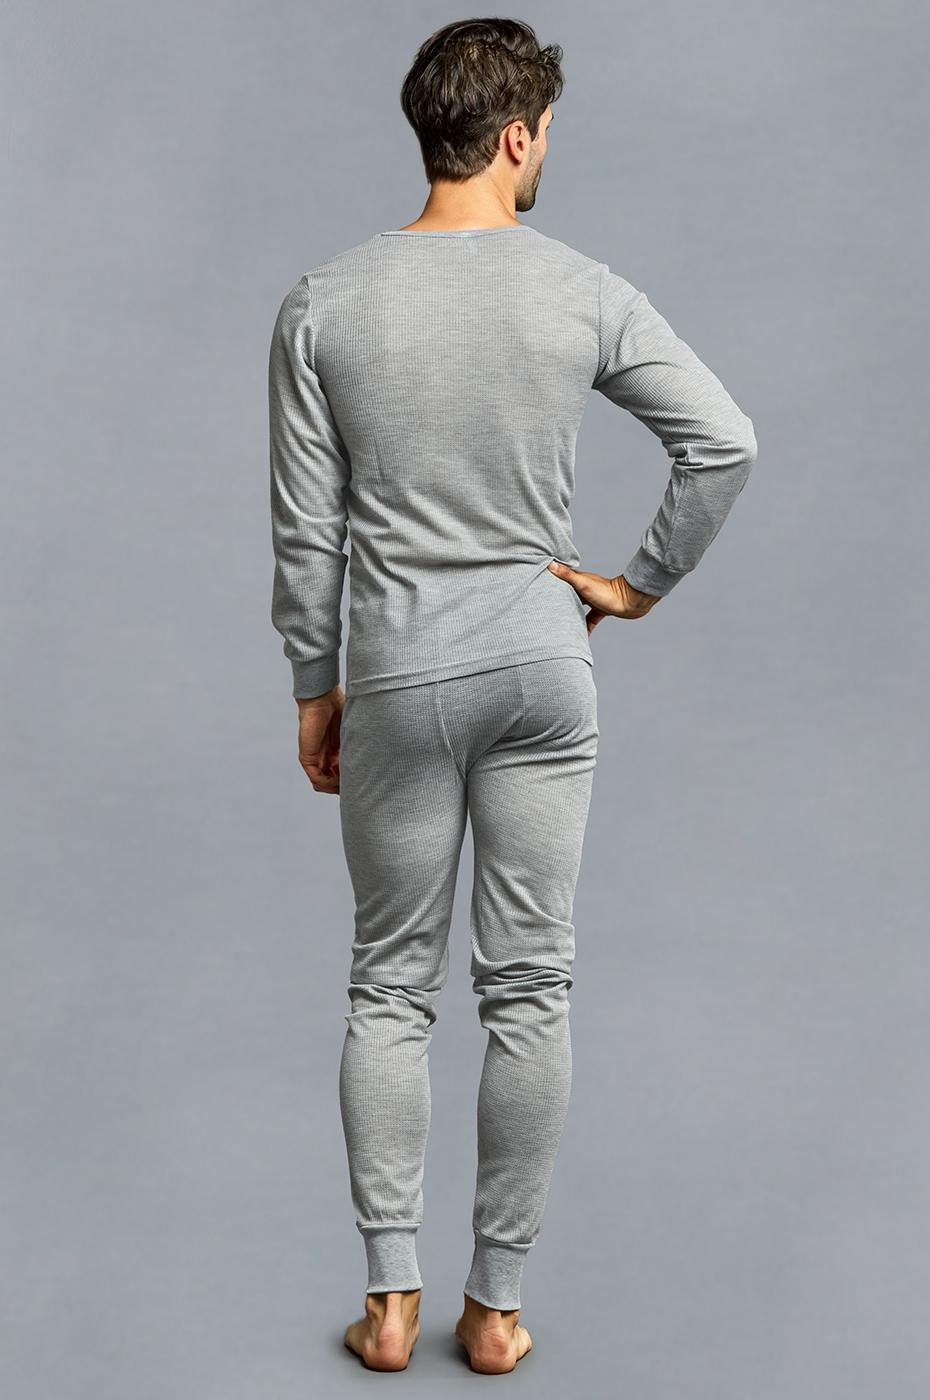 Men-039-s-Thermal-Long-Underwear-Top-Bottom-Medium-Weight-Waffle-Knit-Warm-Layering miniatuur 7